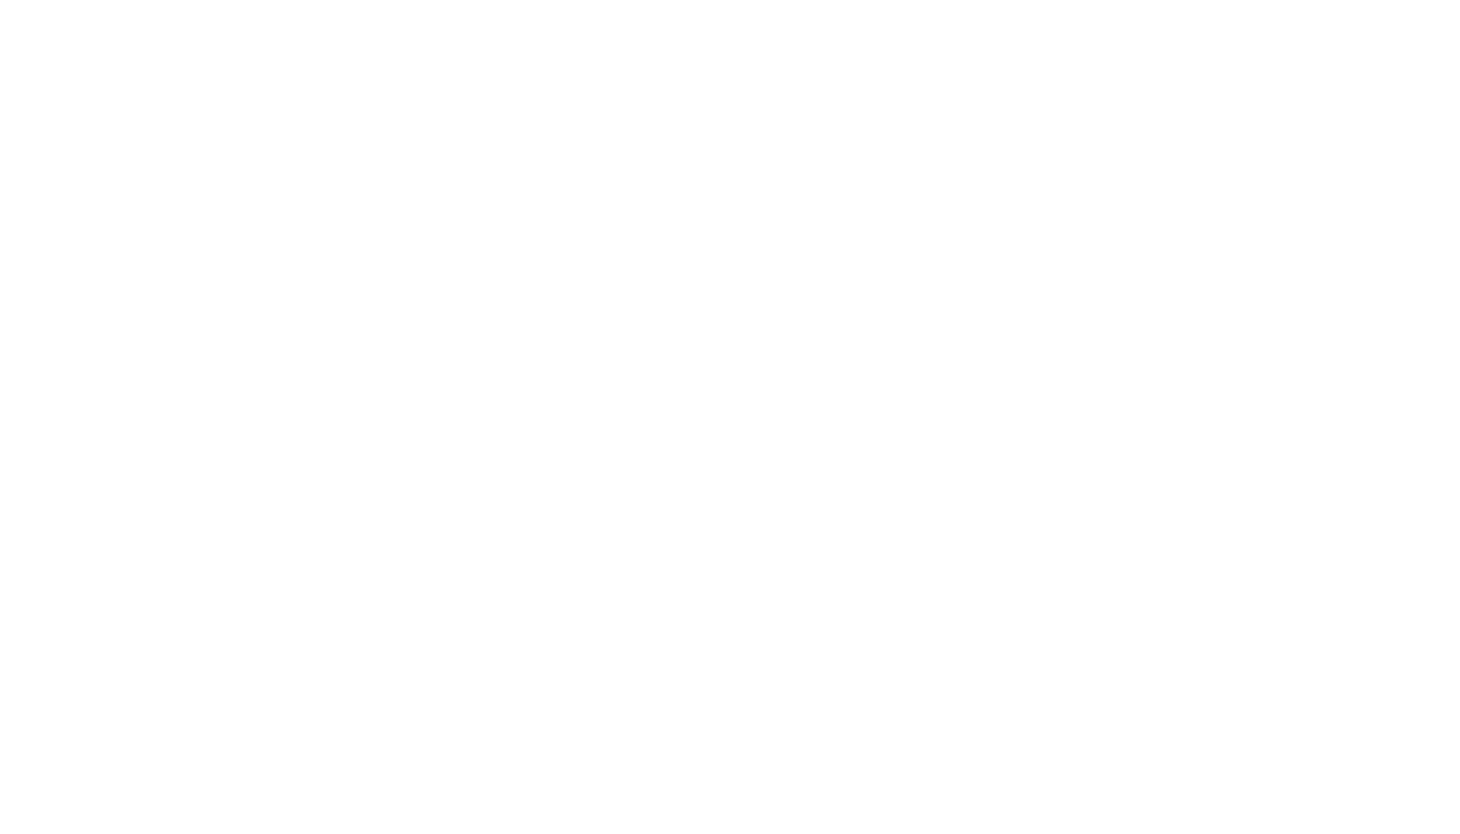 abf-logo-confiance-cicinvestissement.png